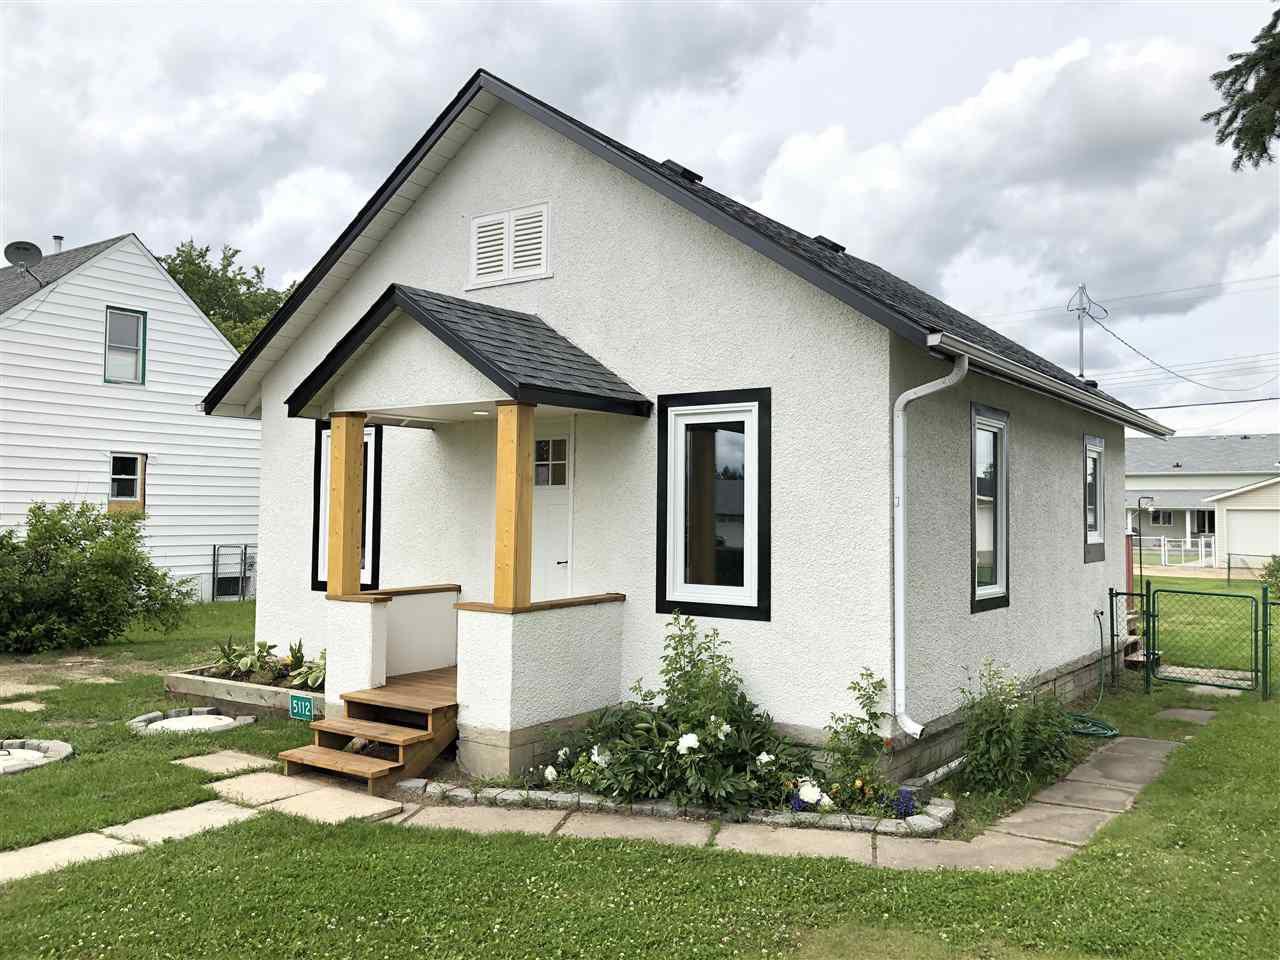 Main Photo: 5112 50 Avenue: Pickardville House for sale : MLS®# E4164639